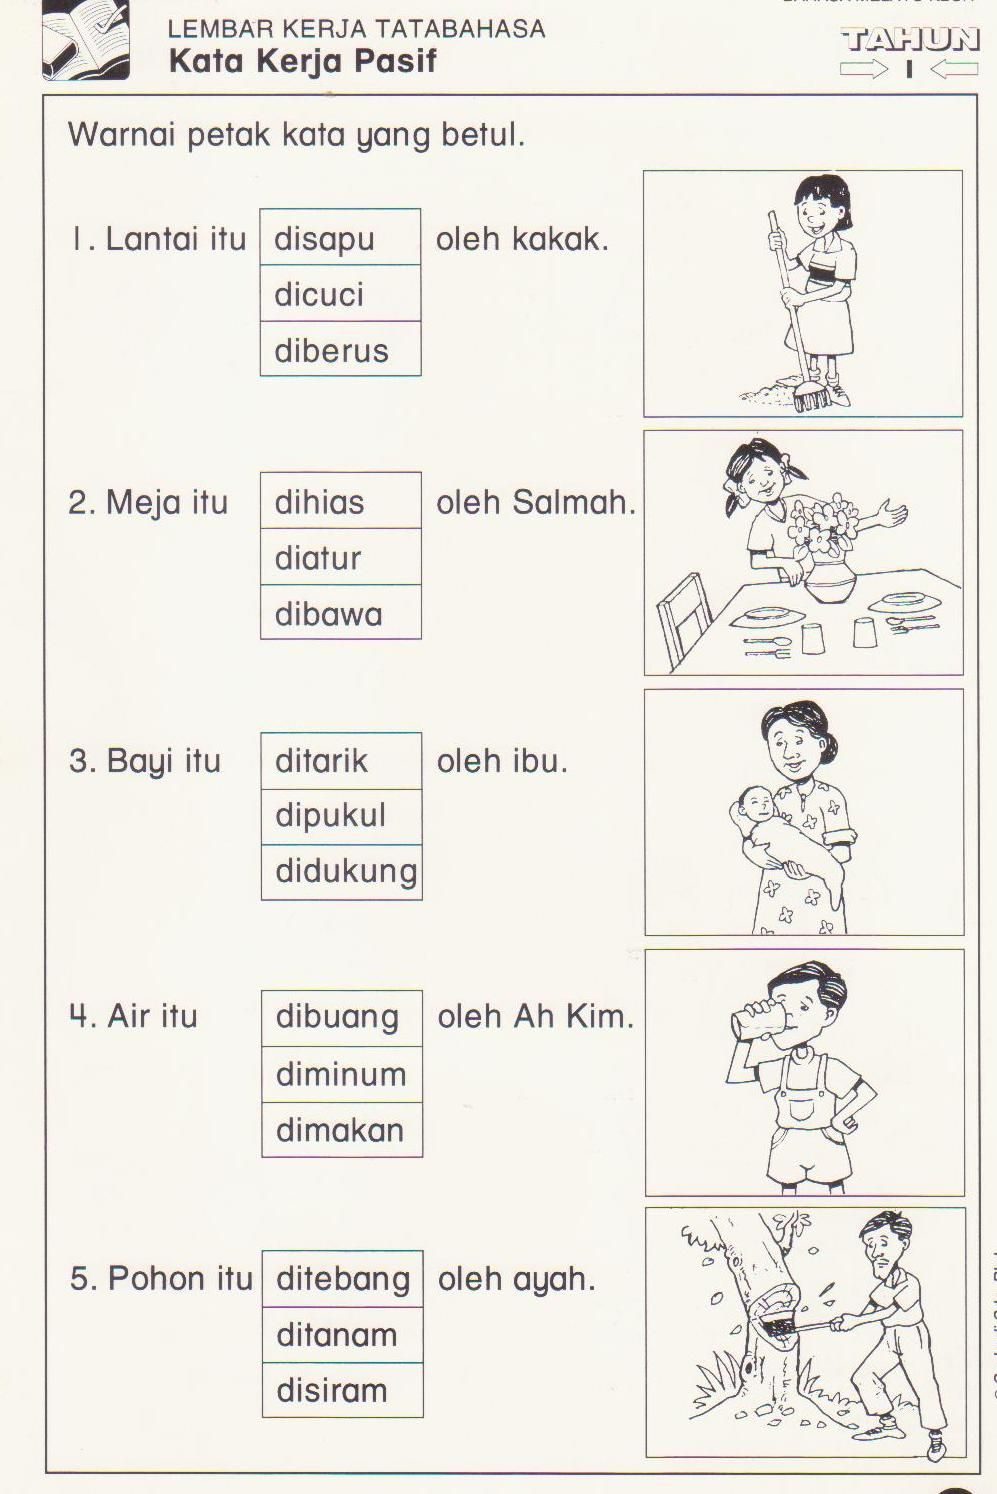 Kata Kerja Pemahaman Membaca Lembar Kerja Belajar Ejaan